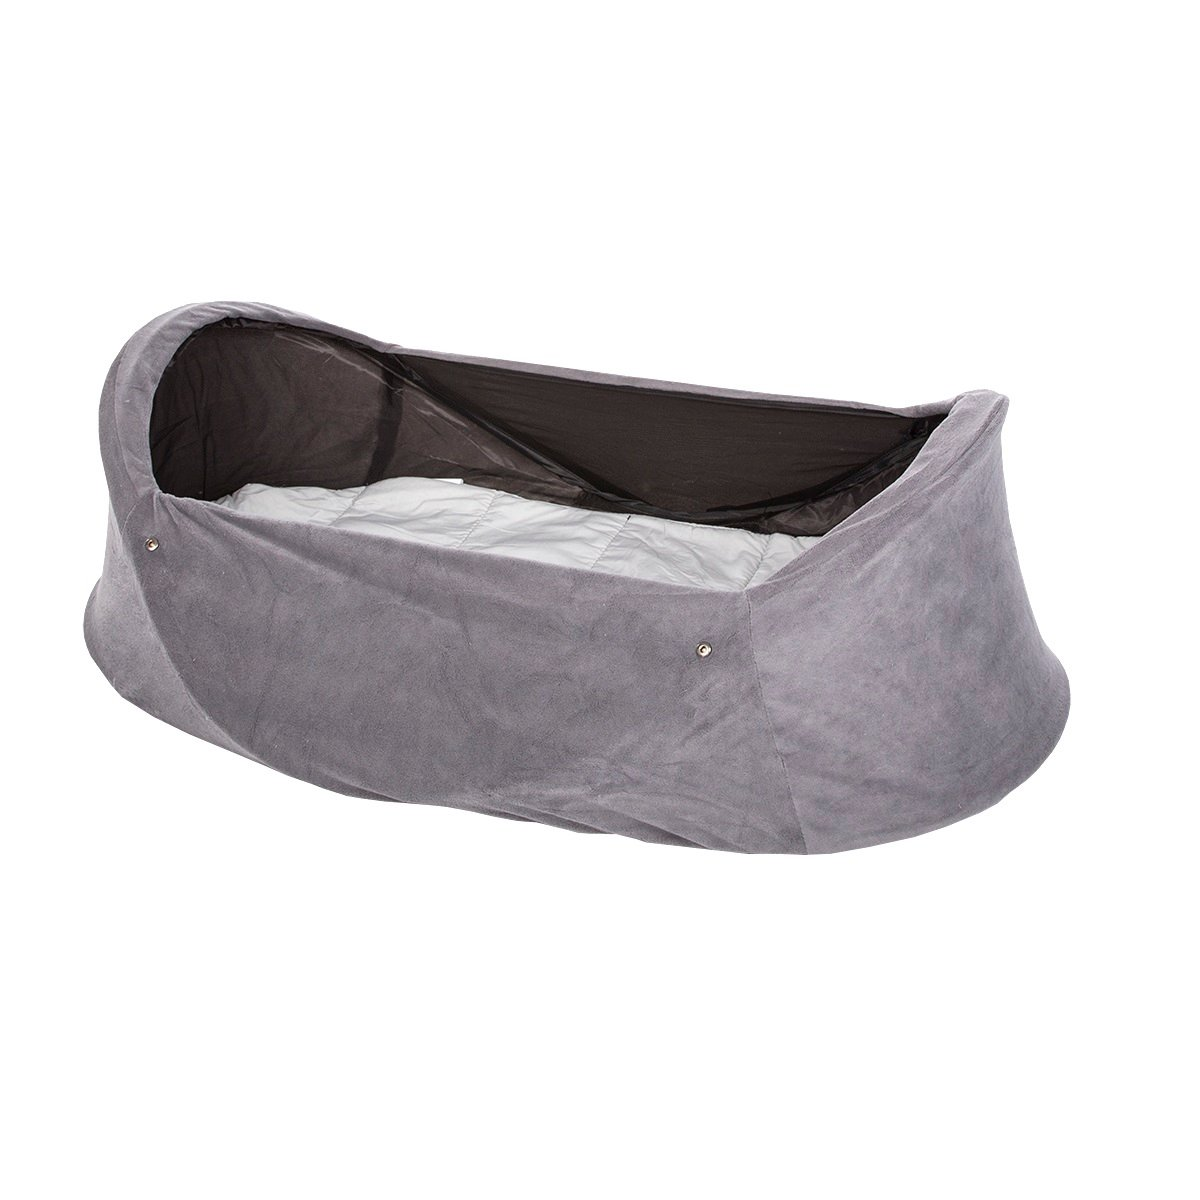 Deryan - Premature BabyBox - Grey